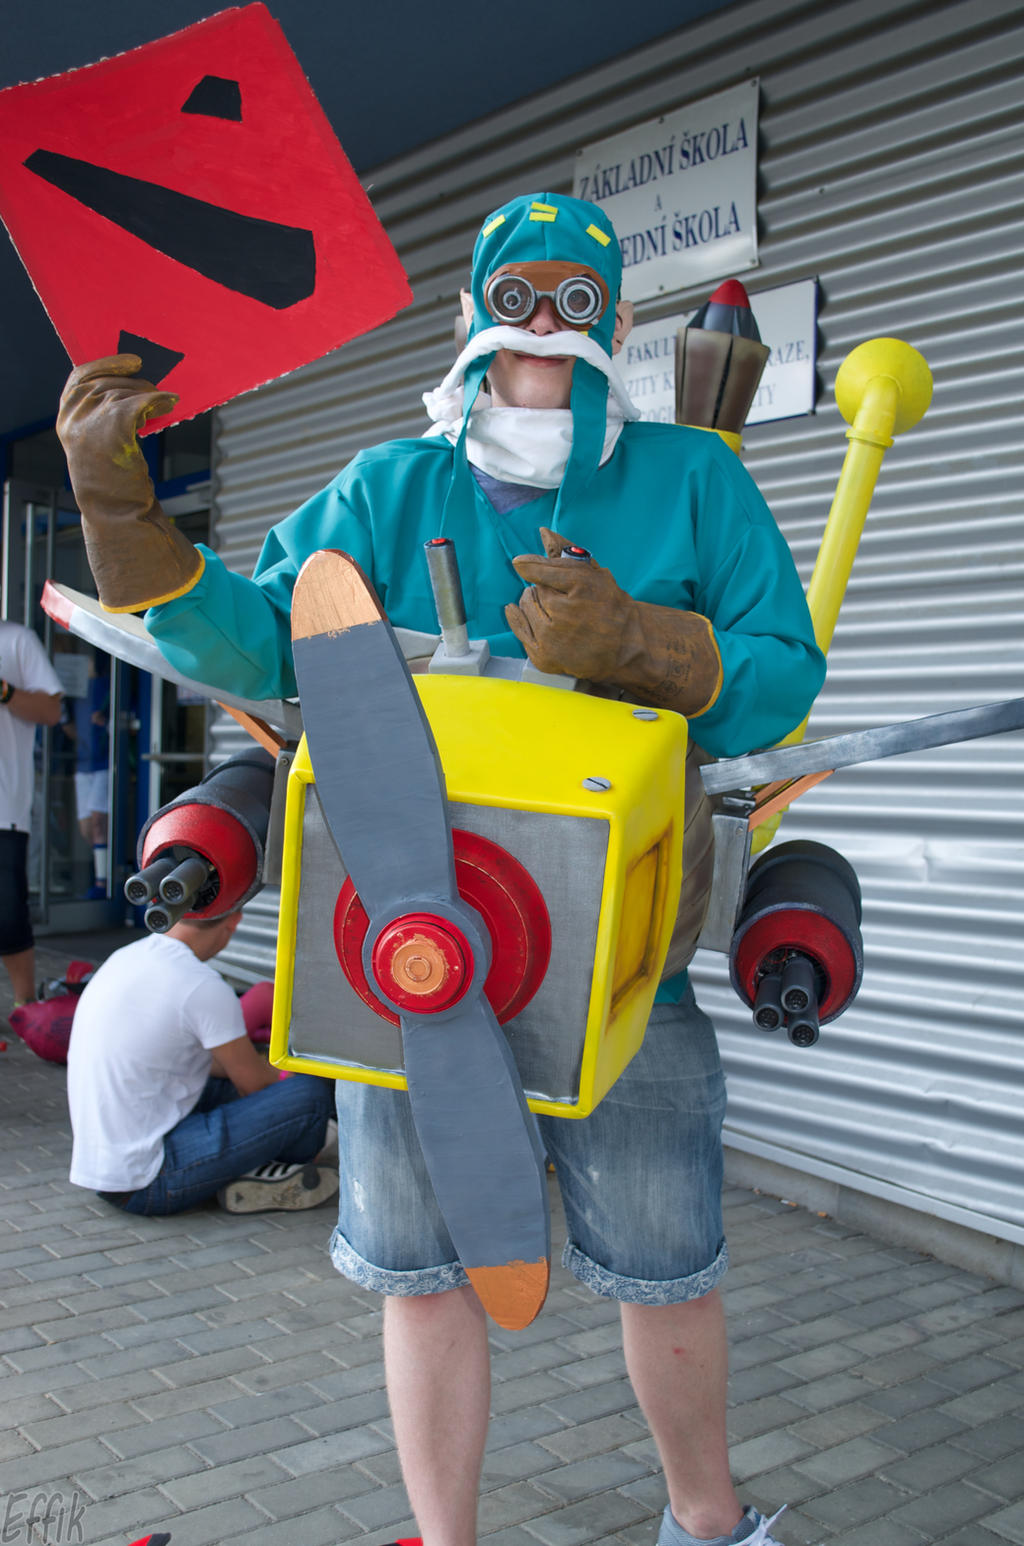 gyrocopter cosplay dota 2 by tanakhtcosplay on deviantart